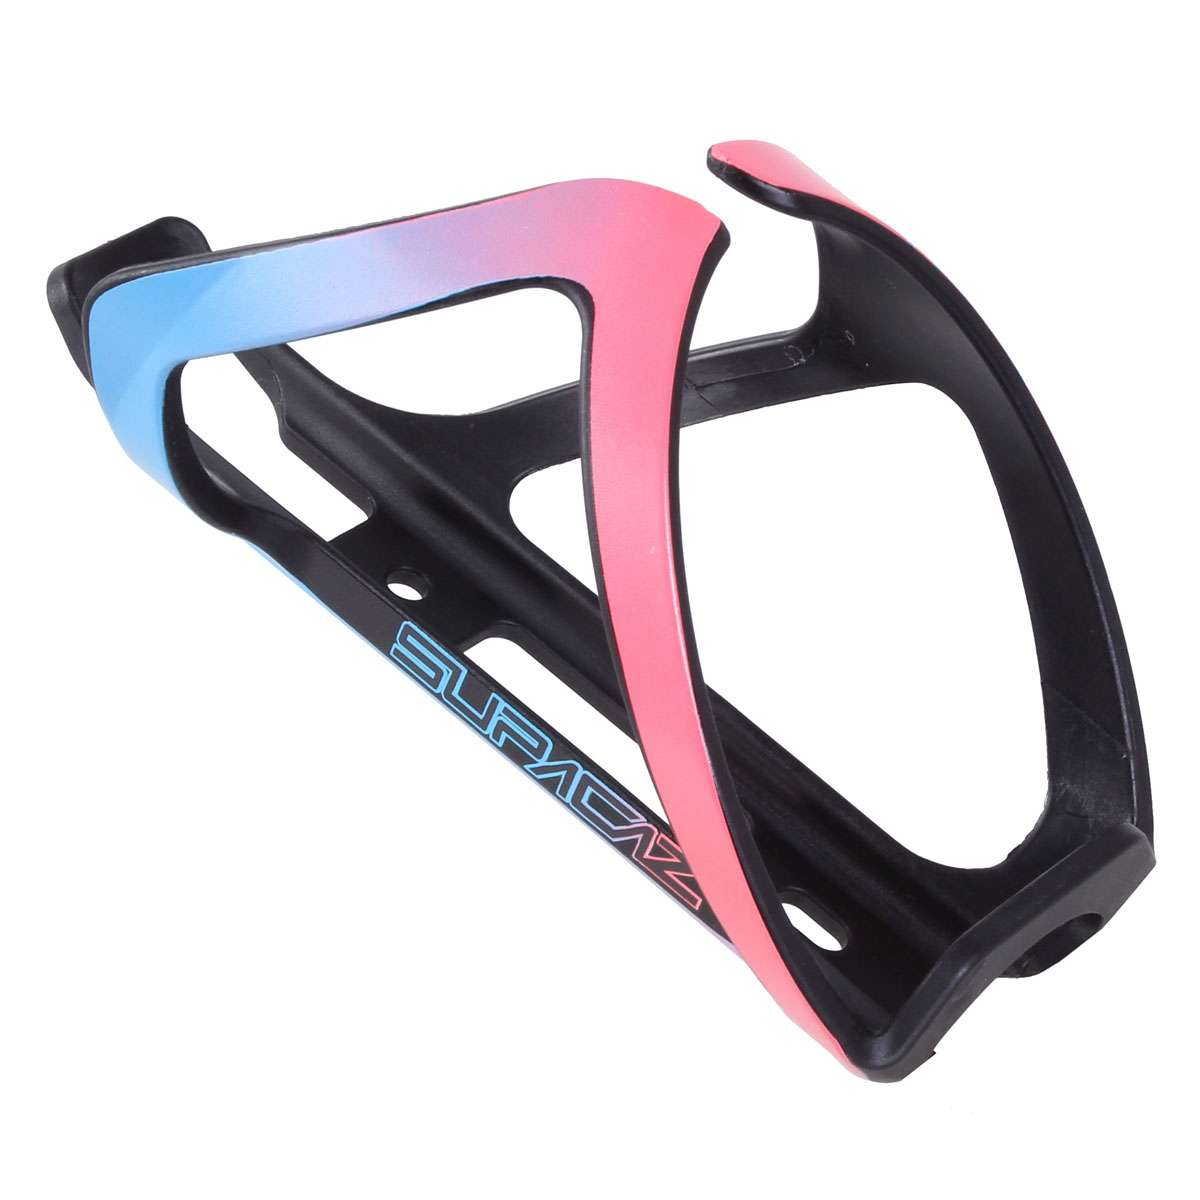 Supacaz Tron Side Load Bottle Cage - Neon Pink & Neon Blue - CG-38